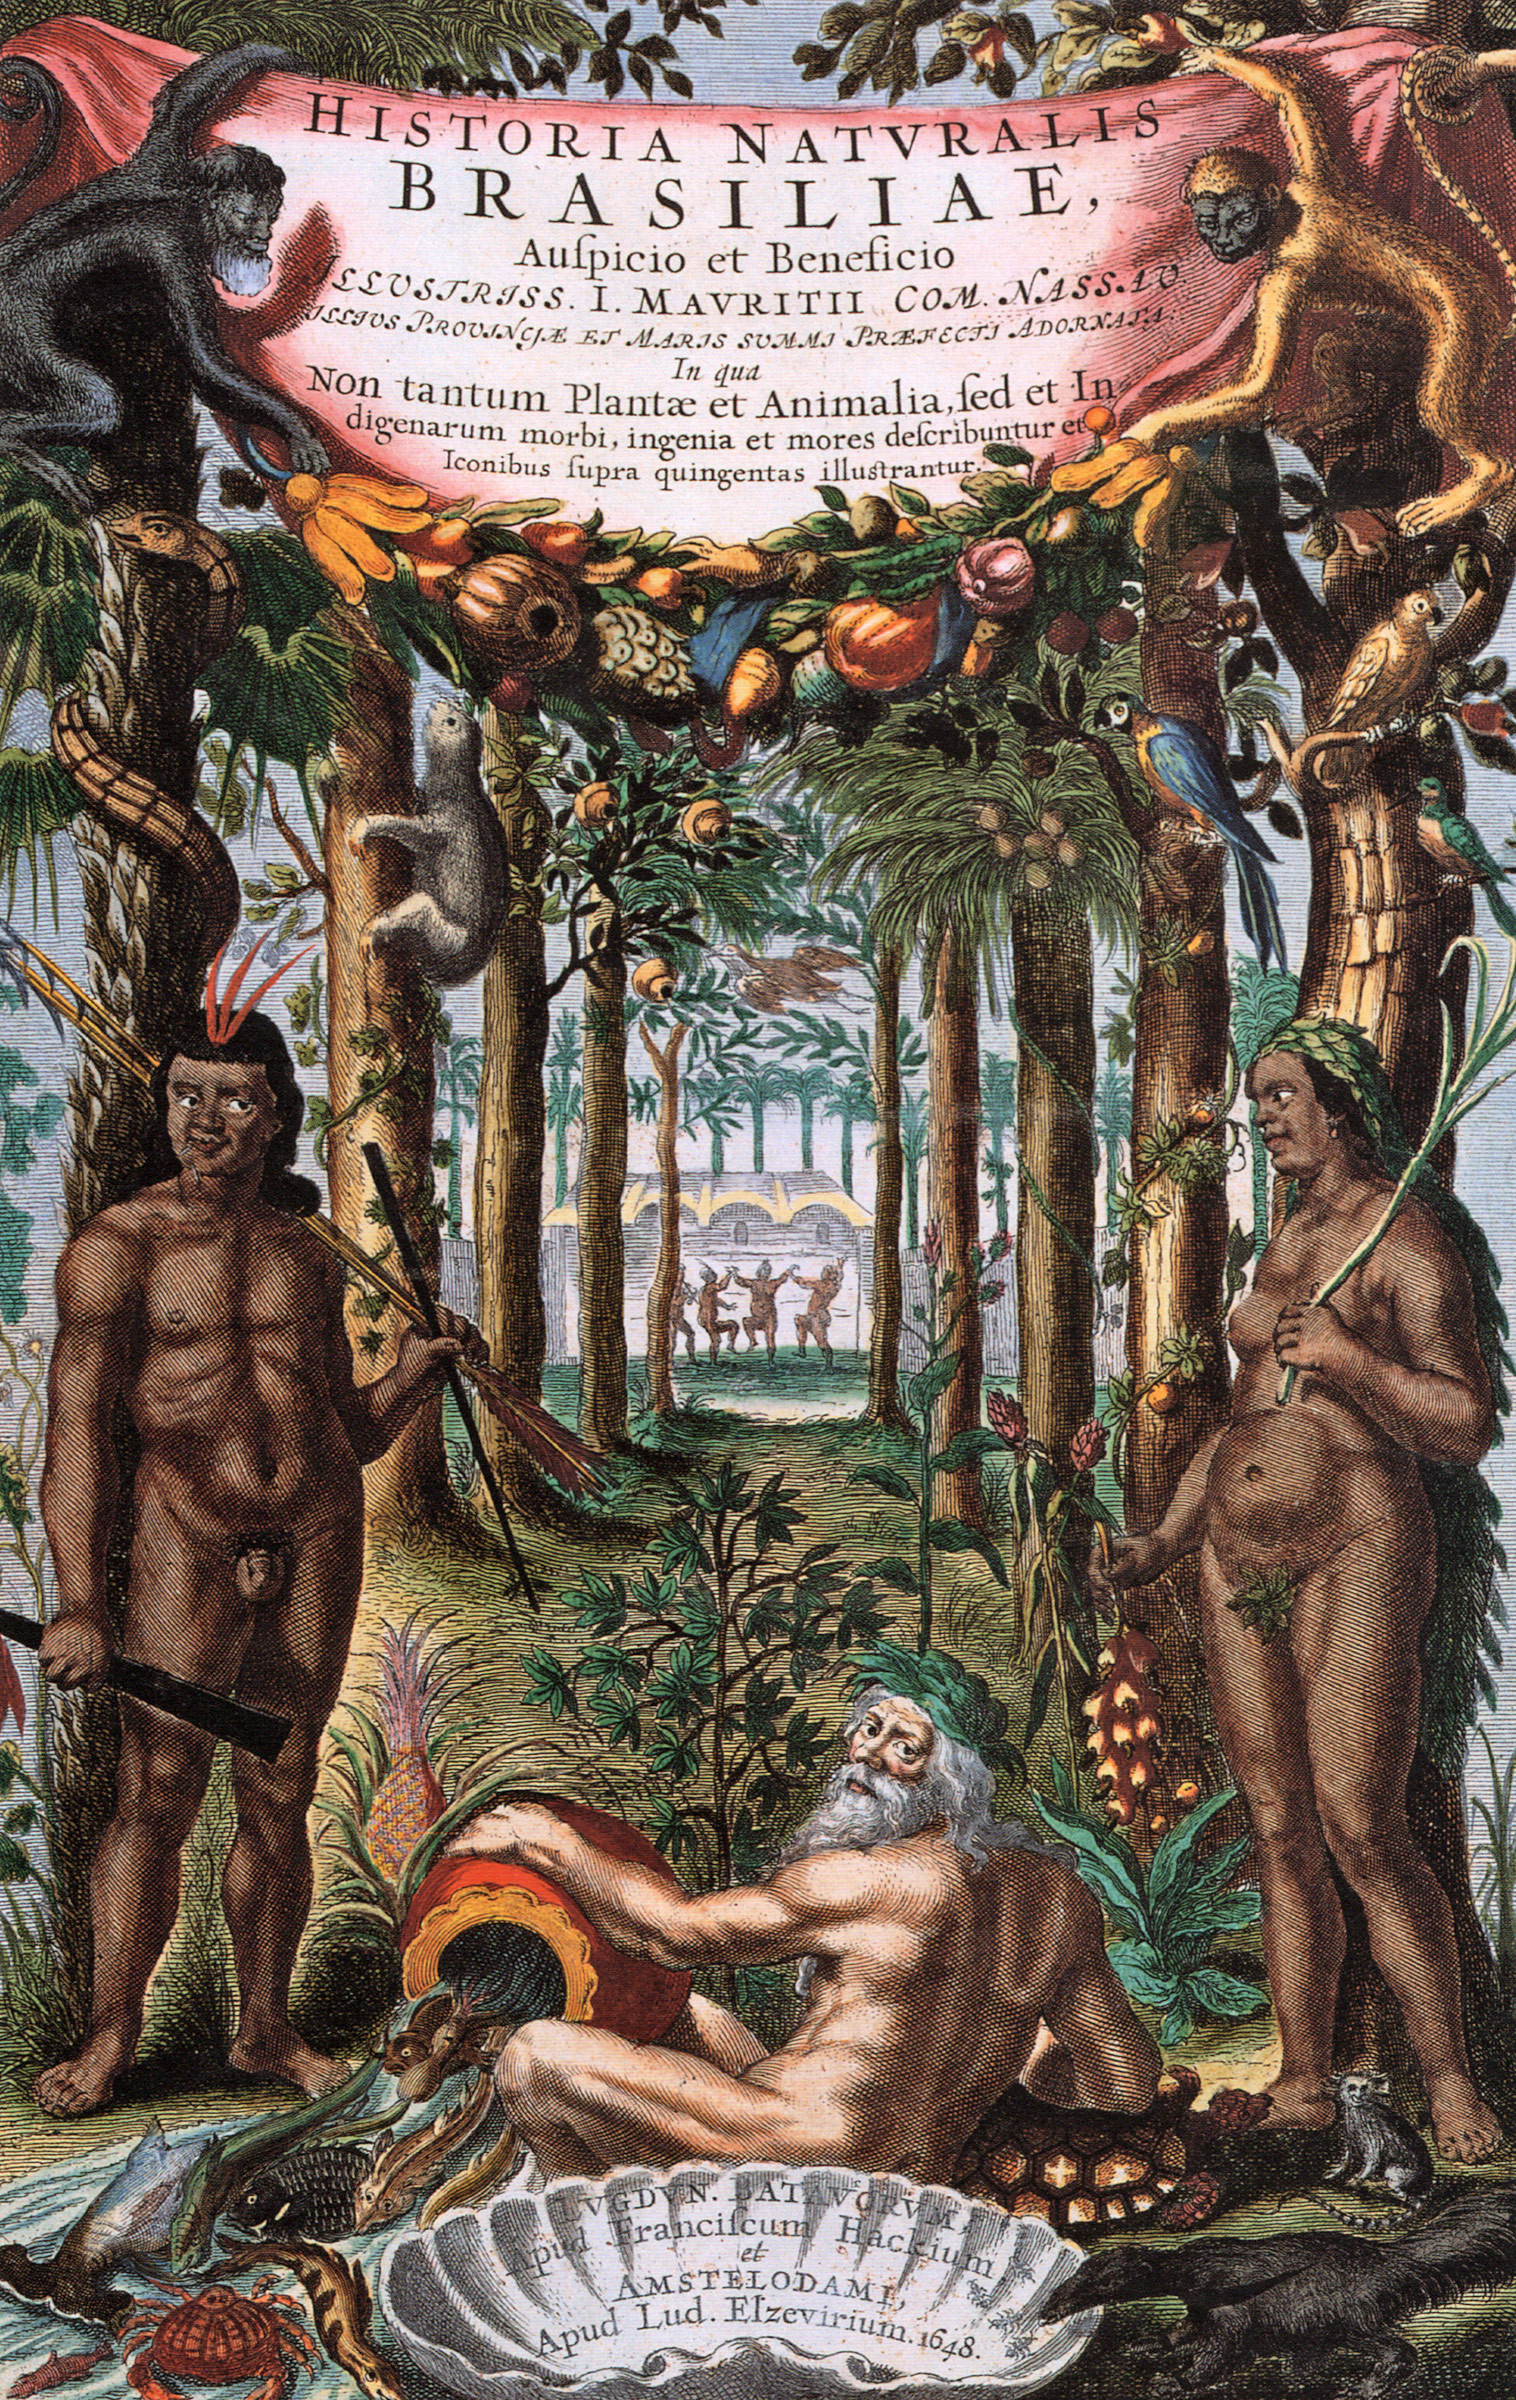 Historia-Naturalis-Brasiliae.jpg